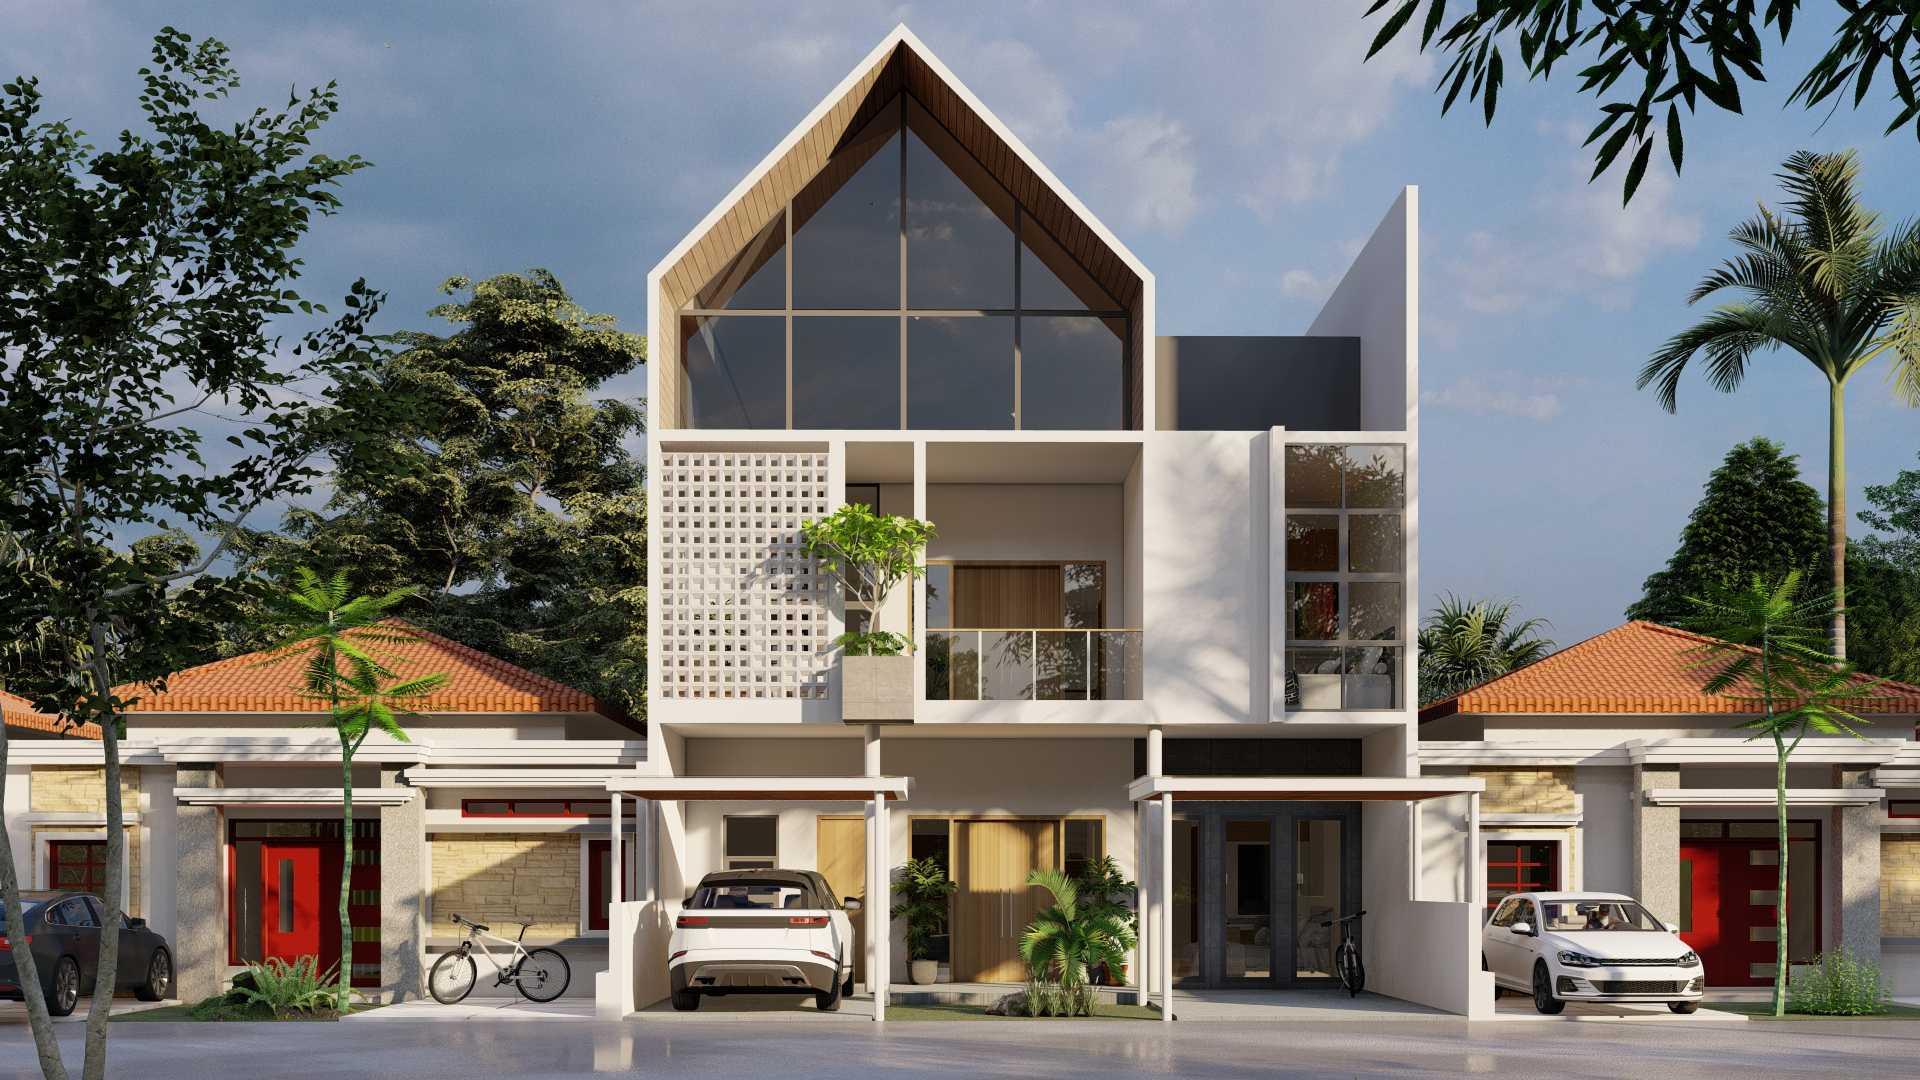 Havia Studio Sh House Bandung, Kota Bandung, Jawa Barat, Indonesia Bandung, Kota Bandung, Jawa Barat, Indonesia Havia-Studio-Sh-House   128462